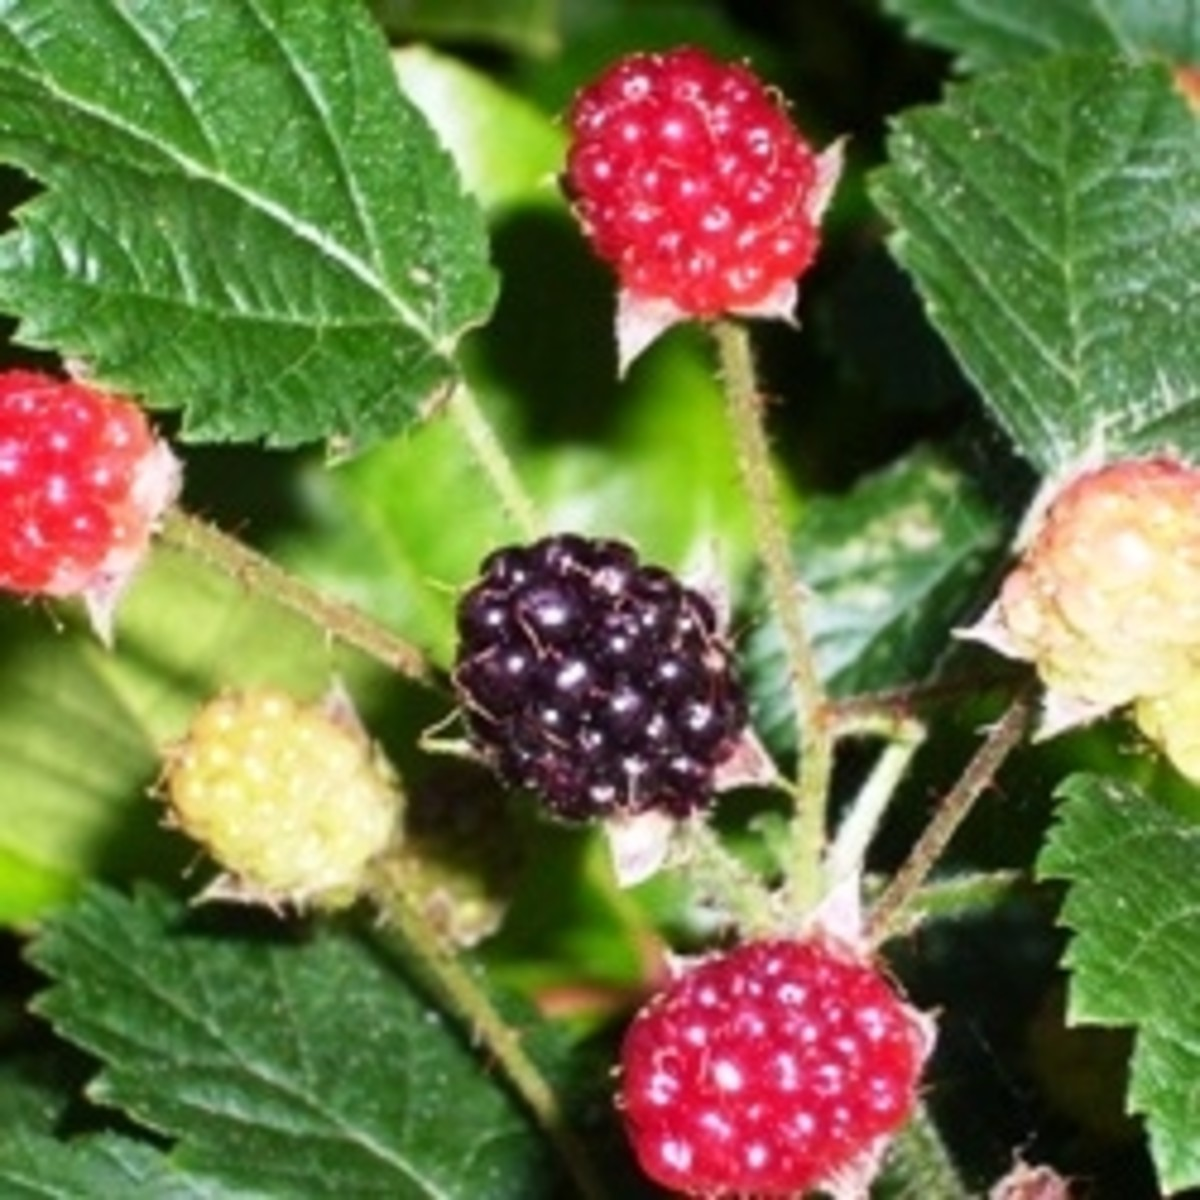 Native Edible Plants Australia: Edible Wild Berries